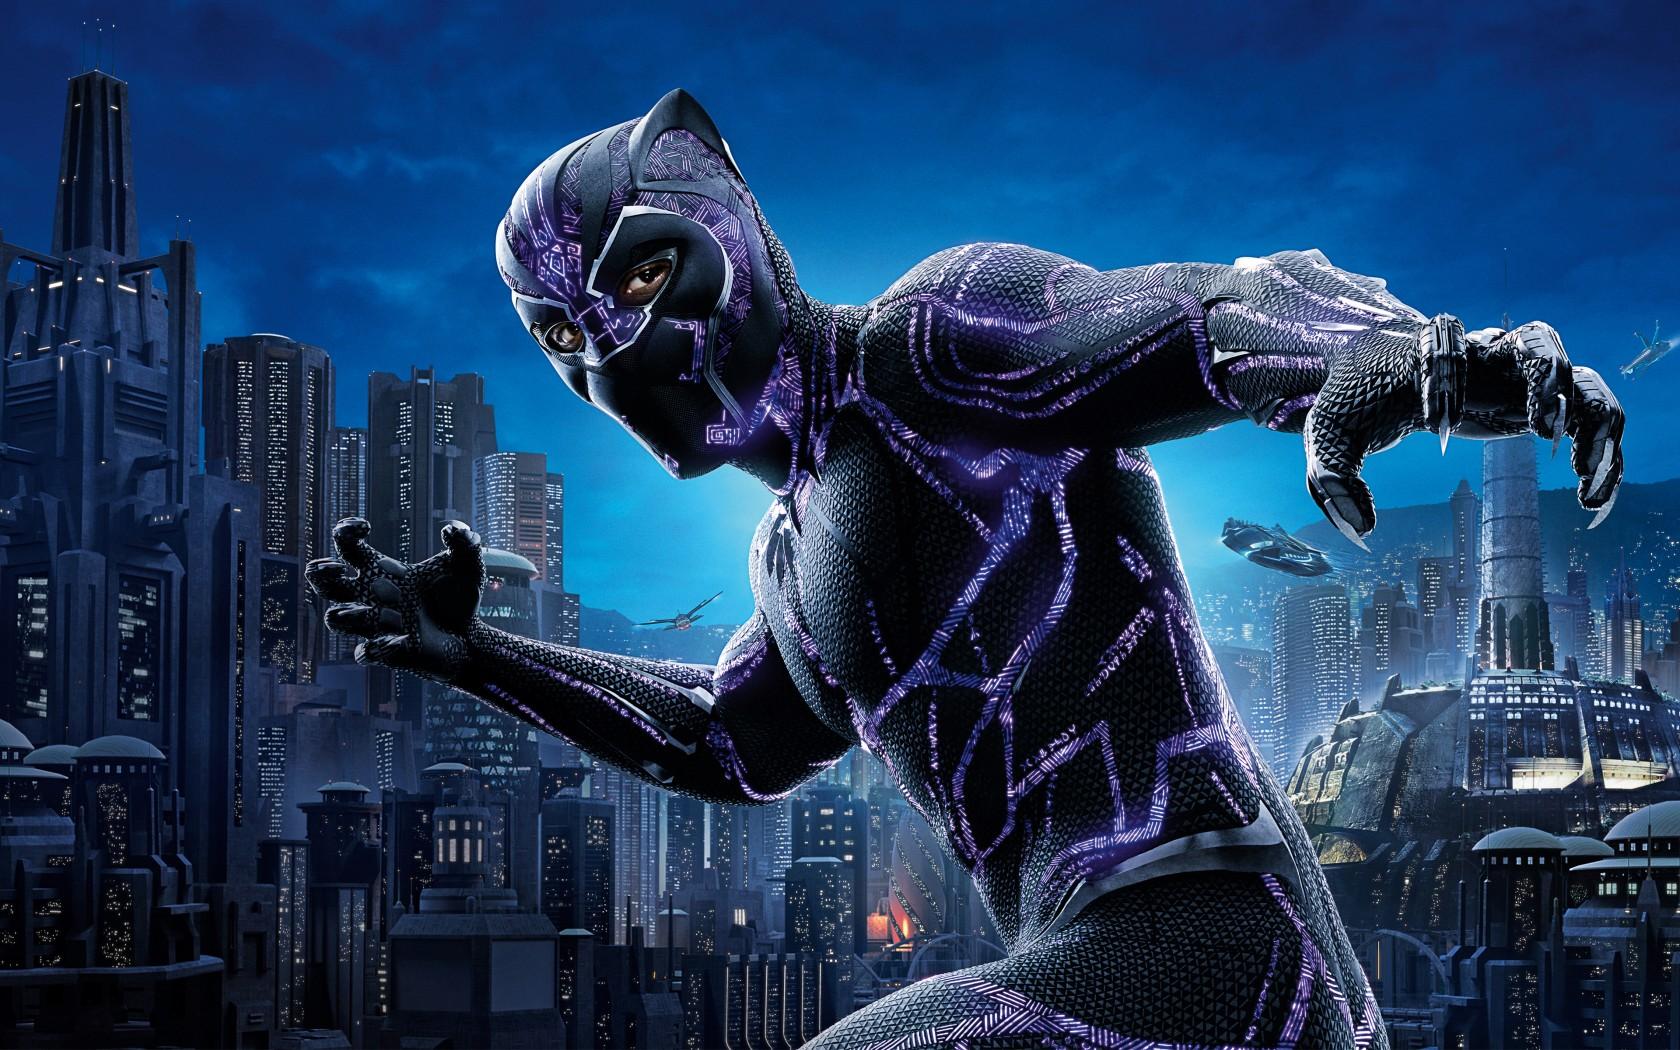 8k Car Wallpaper Download Black Panther Movie 4k 8k Wallpapers Hd Wallpapers Id